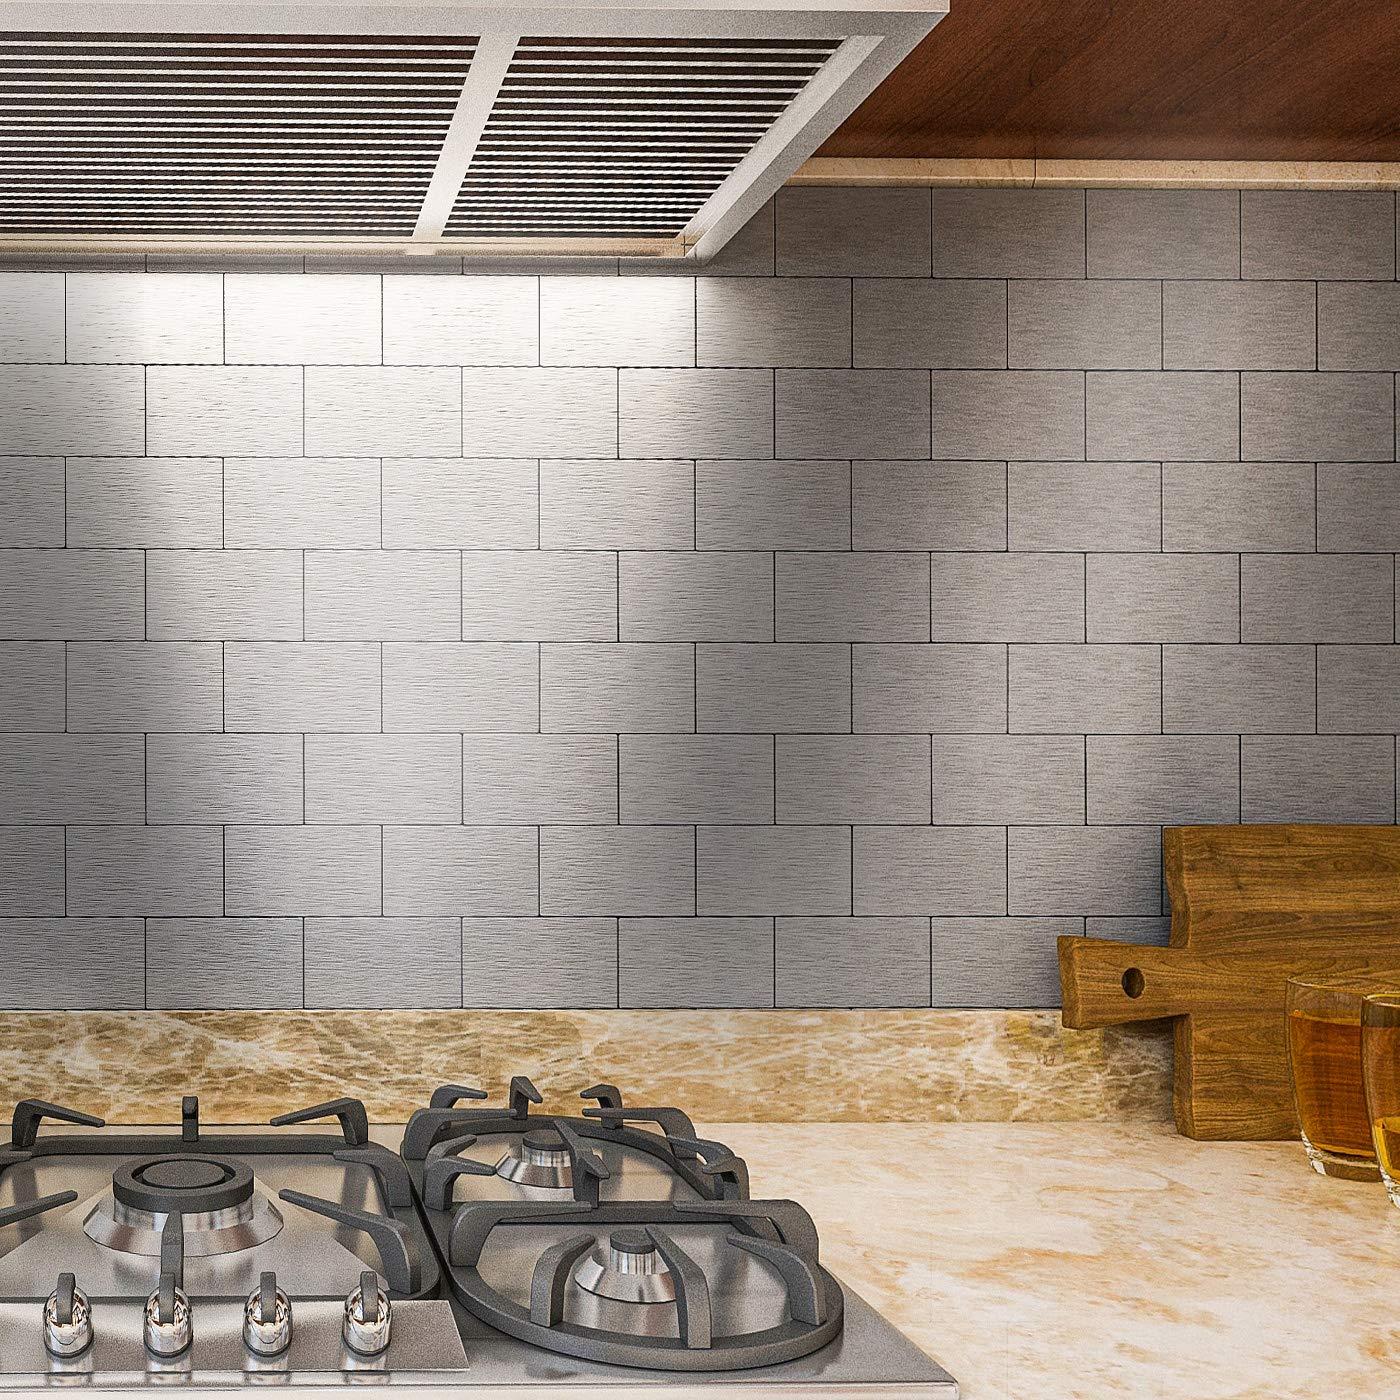 Art3d 32 Piece Peel And Stick Backsplash Tiles Brushed Metal Subway Backsplash Tile For Kitchen 3 X6 Silver Amazon Com